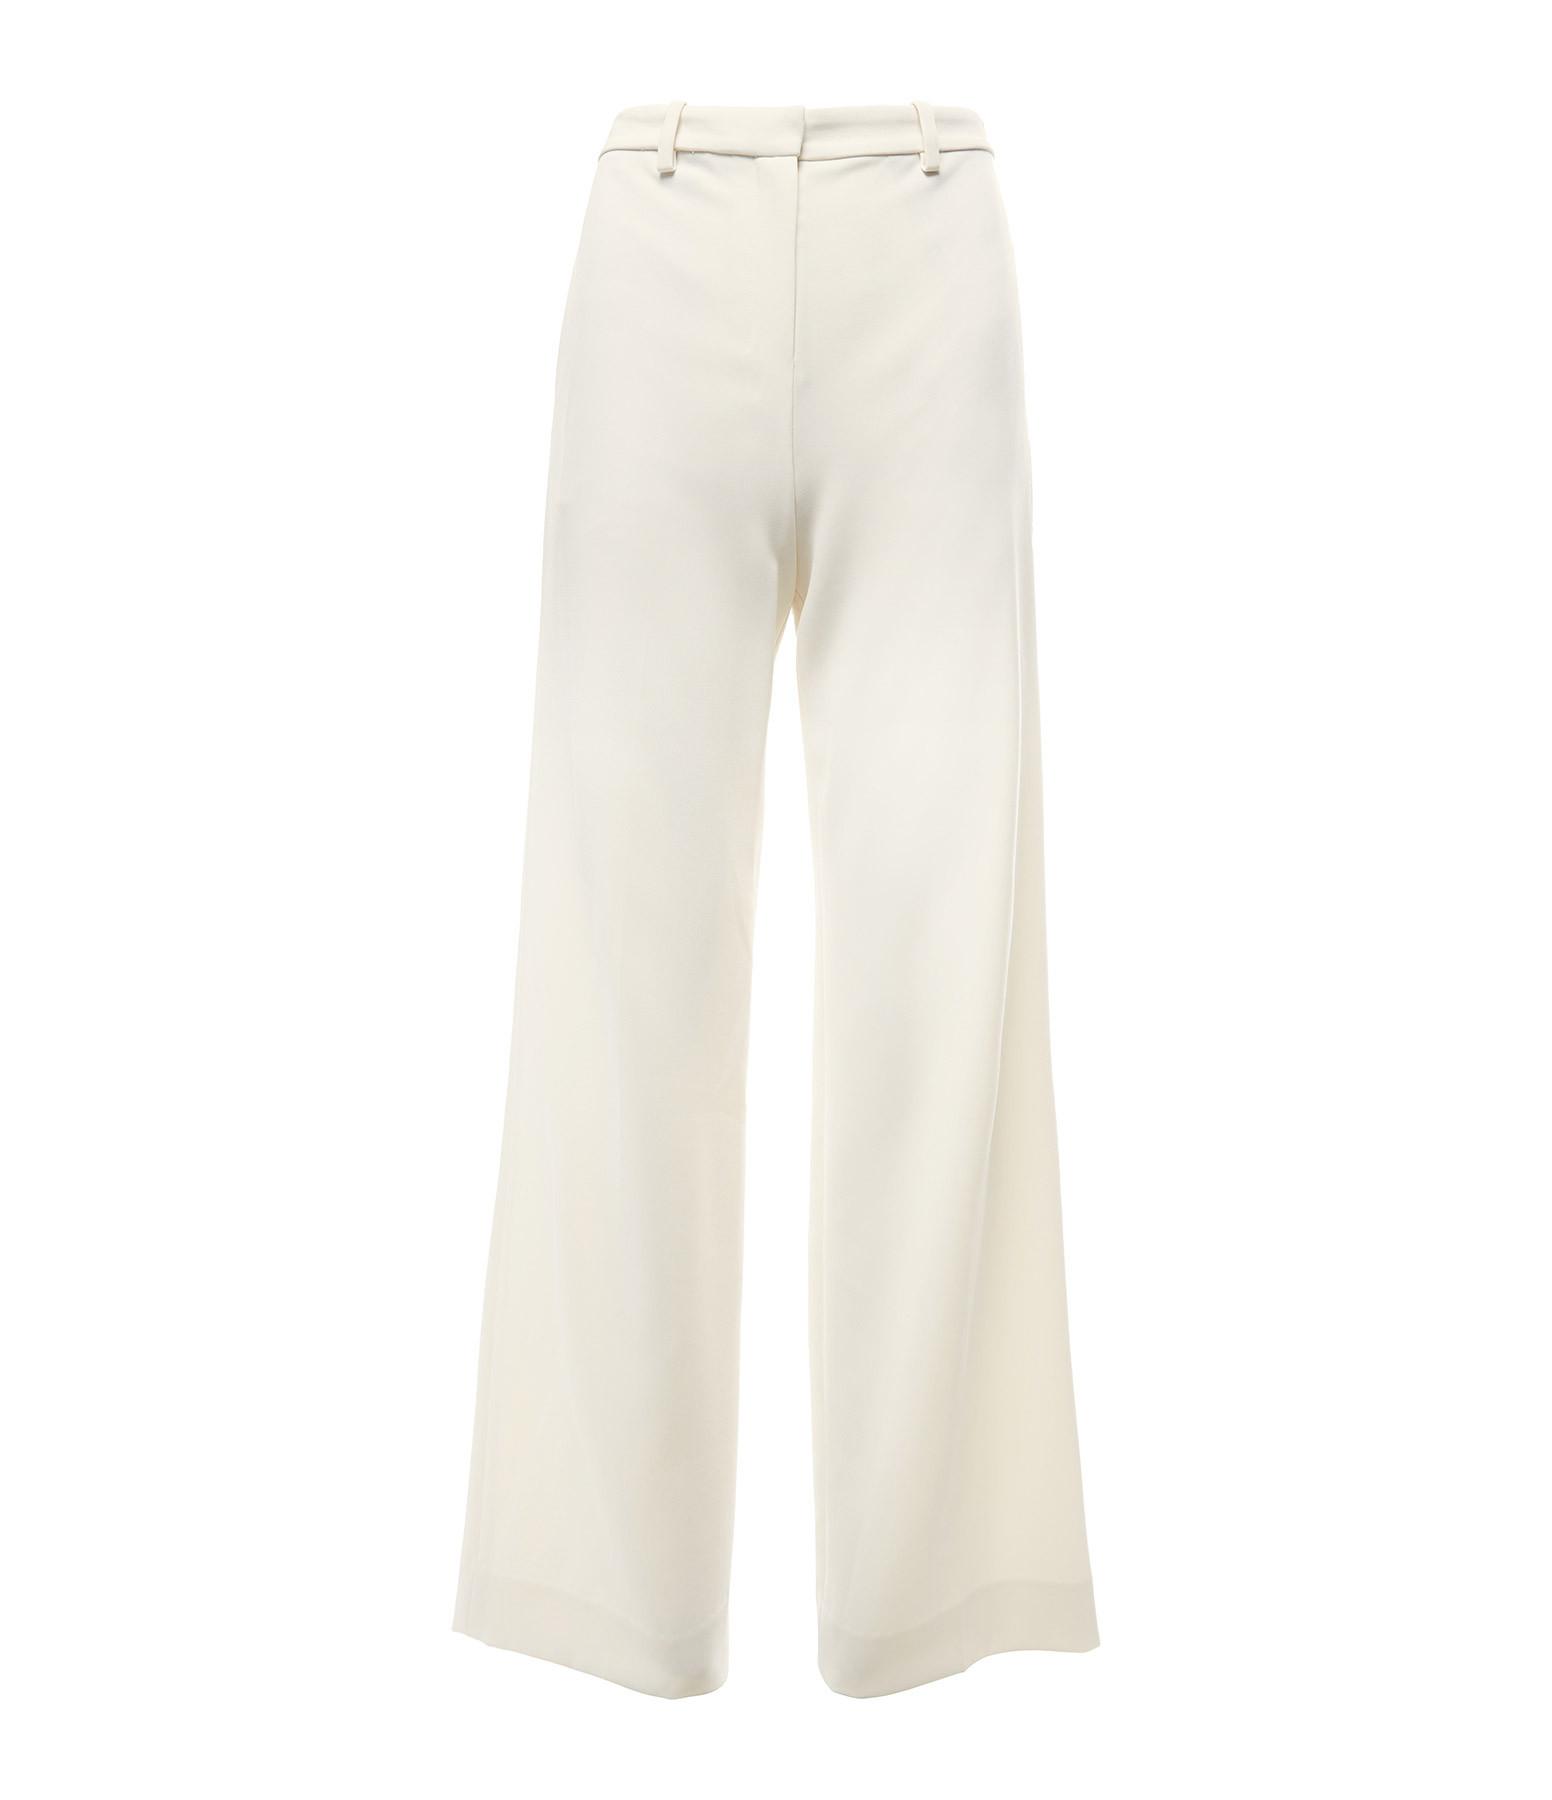 THEORY - Pantalon Crèpe Beige